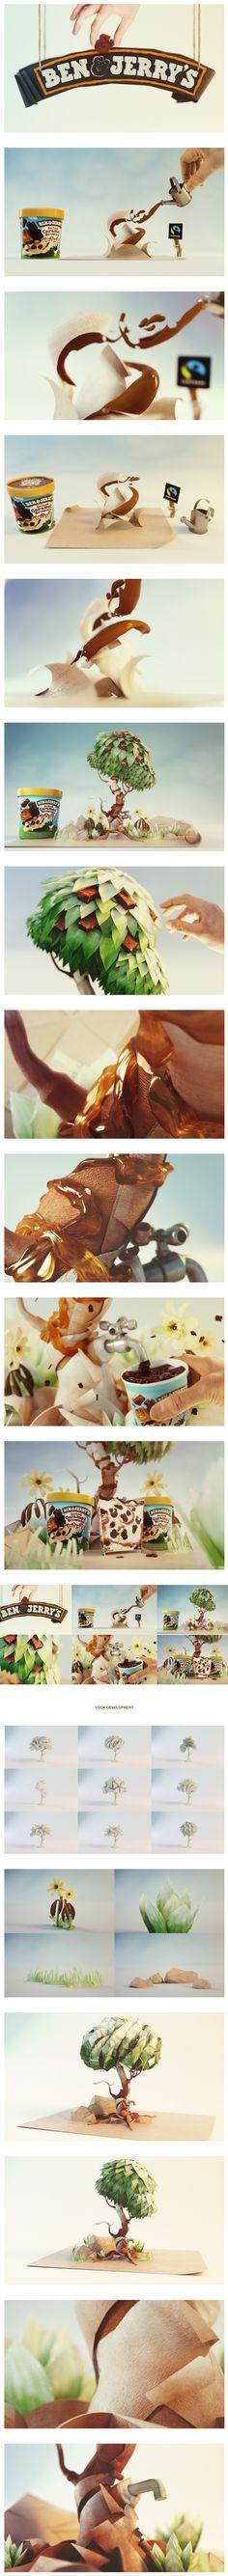 Ben & Jerry's Styleframes  #зеленый #желтый #текстуры